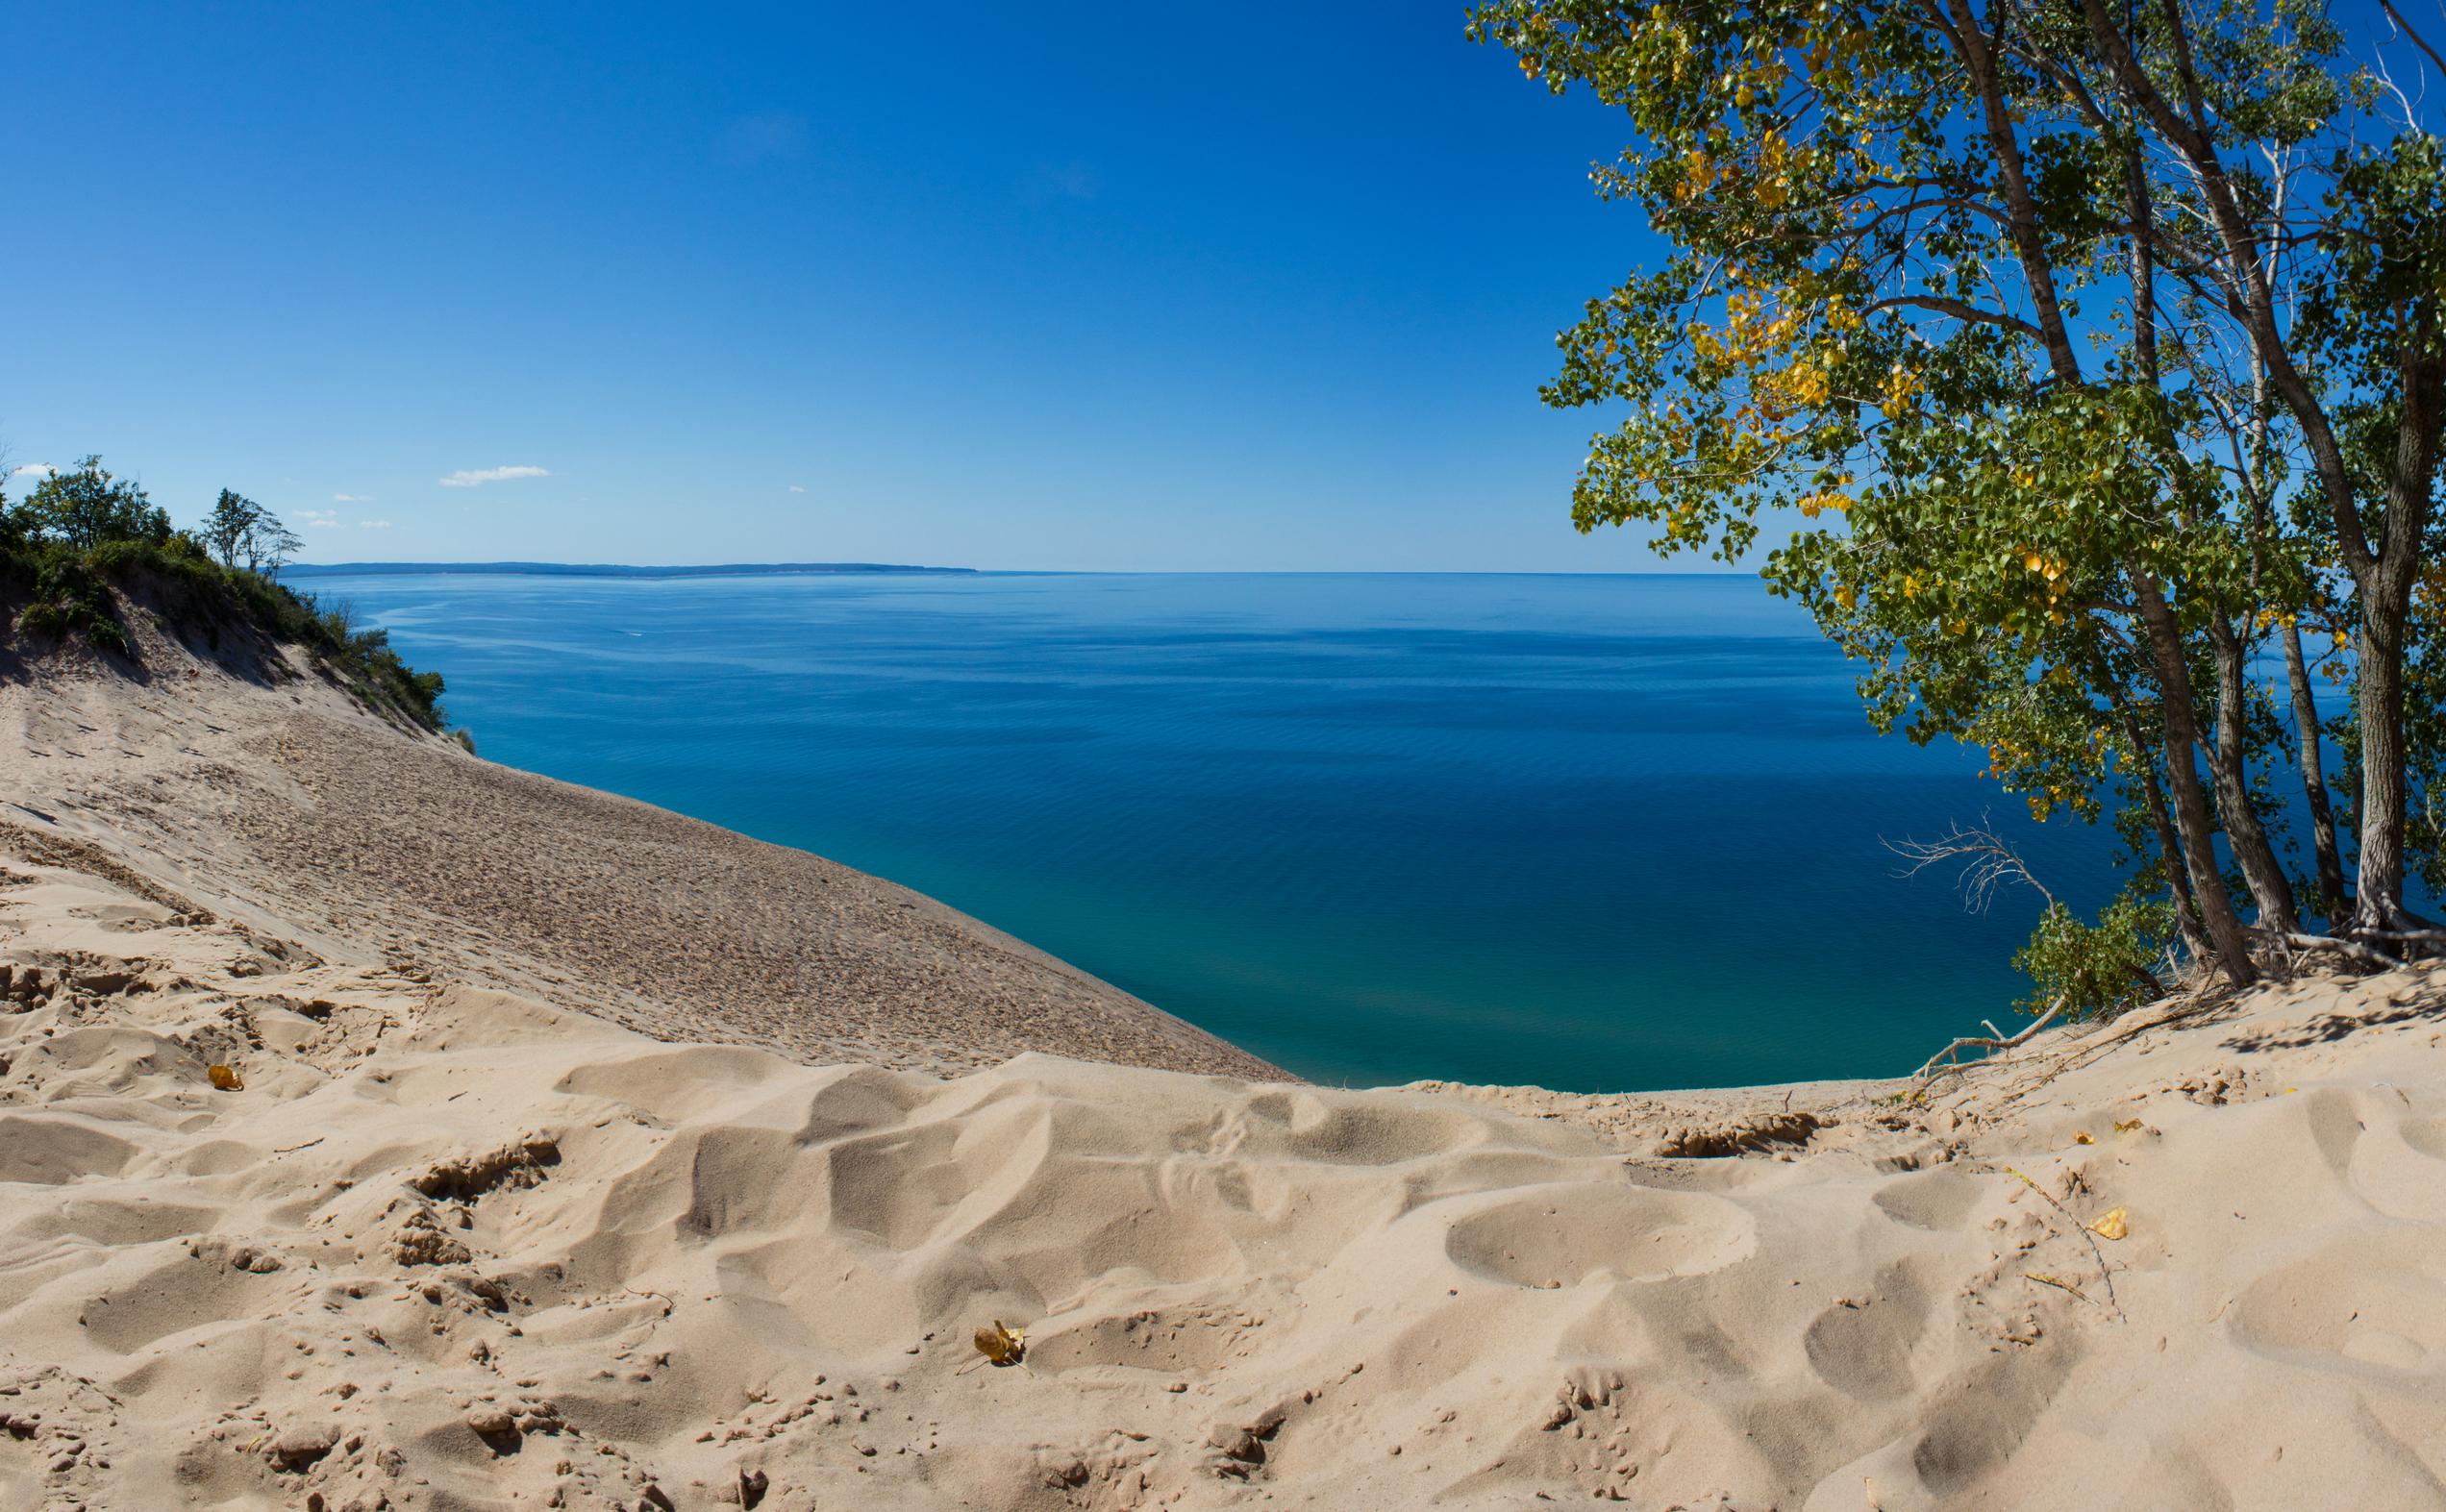 Dune overlook, one of many